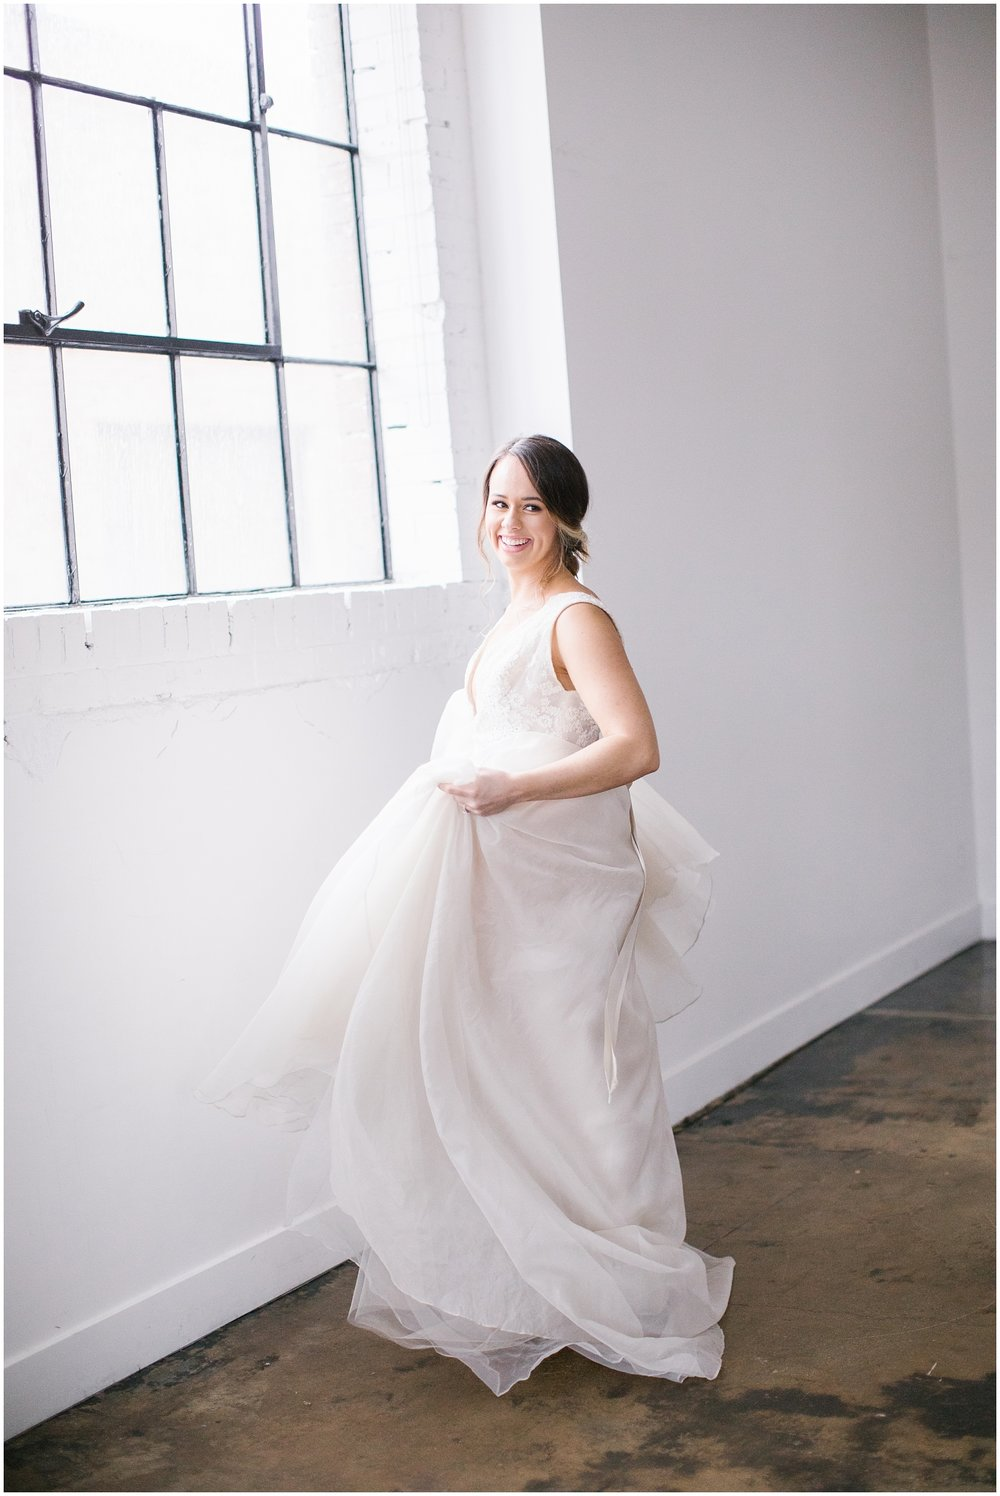 Styled Shoot2-17-40_Lizzie-B-Imagery-Utah-Wedding-Photographer-Park-City-Salt-Lake-City-Charcoal-Loft-Studio.jpg